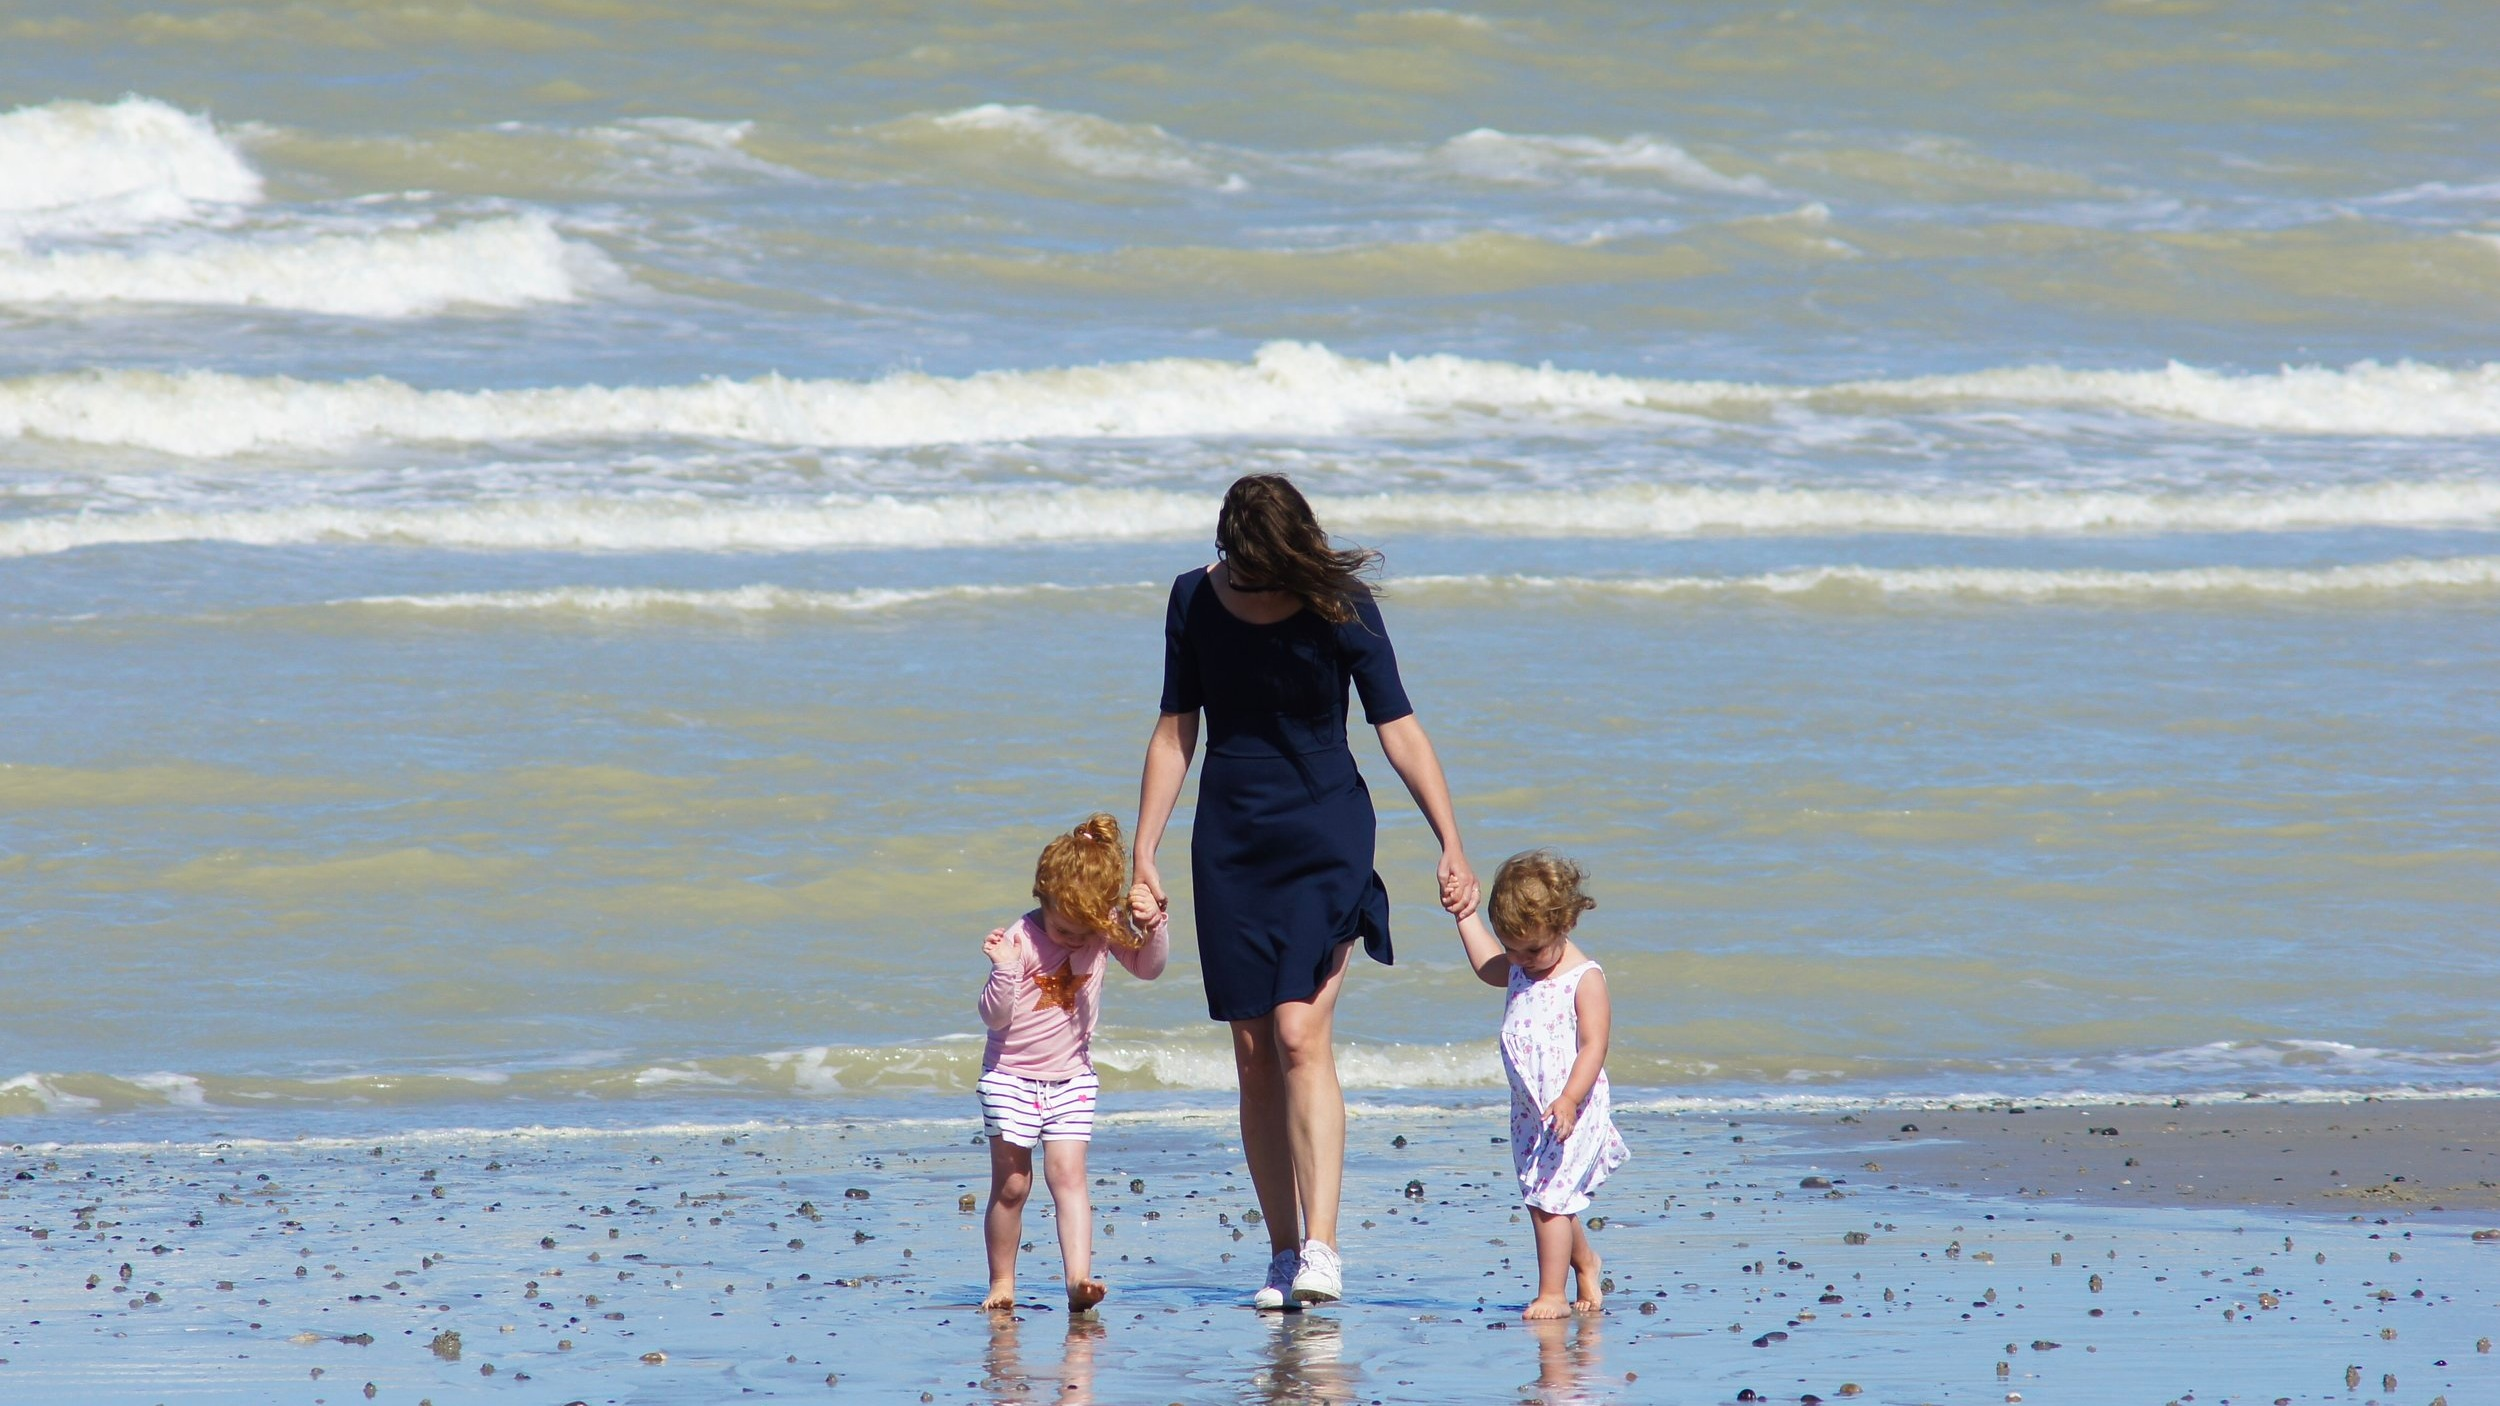 Family beach shot against the sea